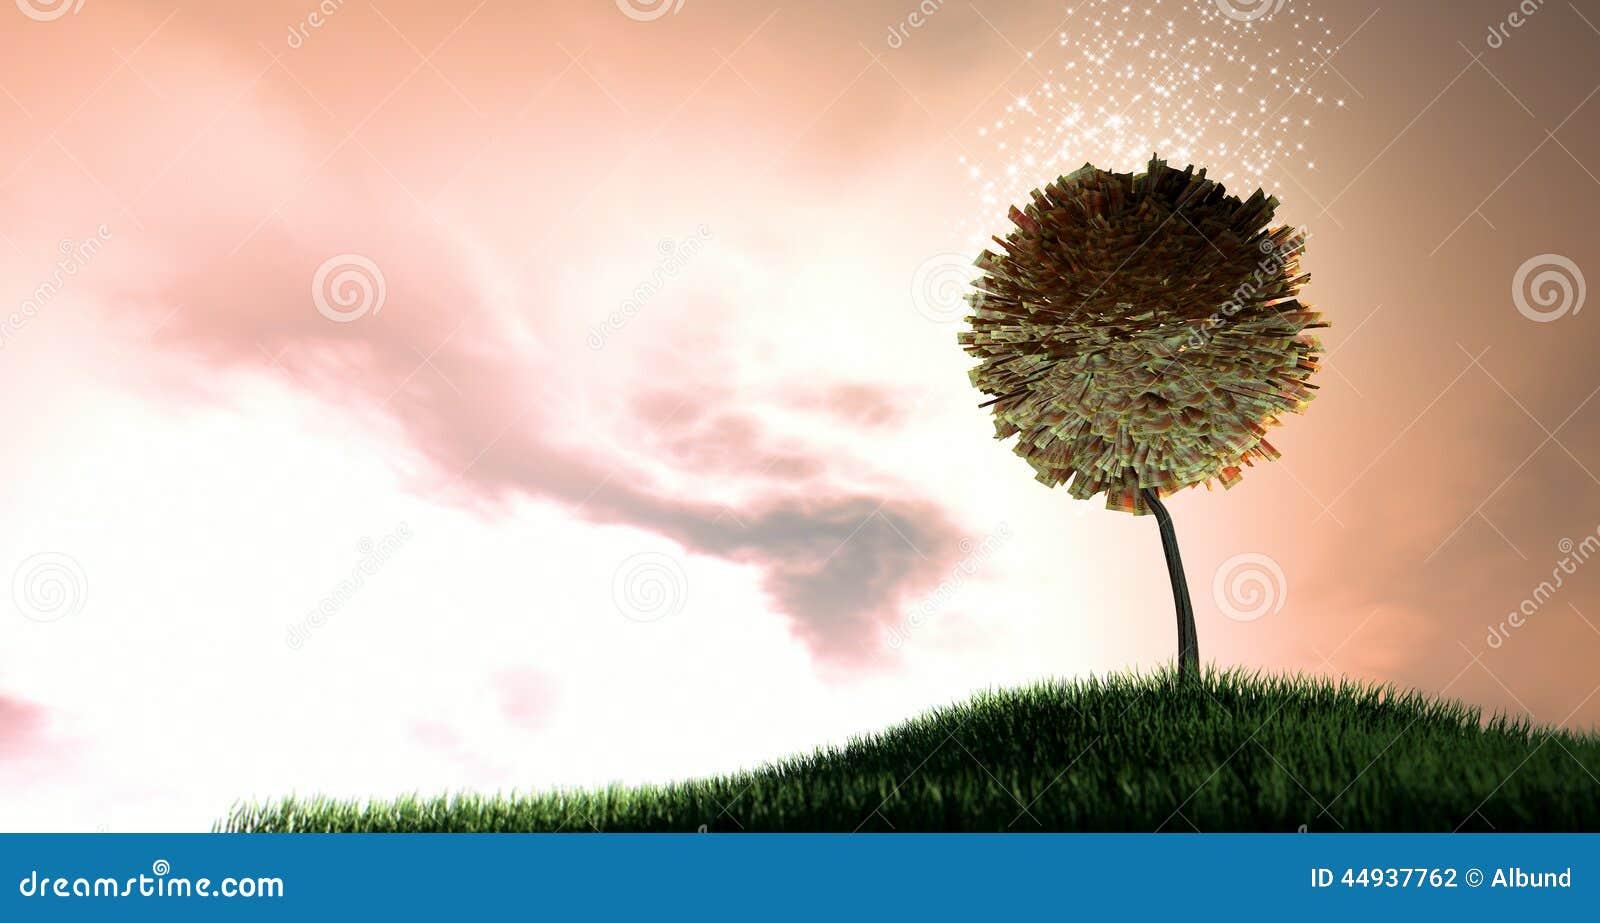 Magical Rand Money Tree Stock Photo - Image: 44937762